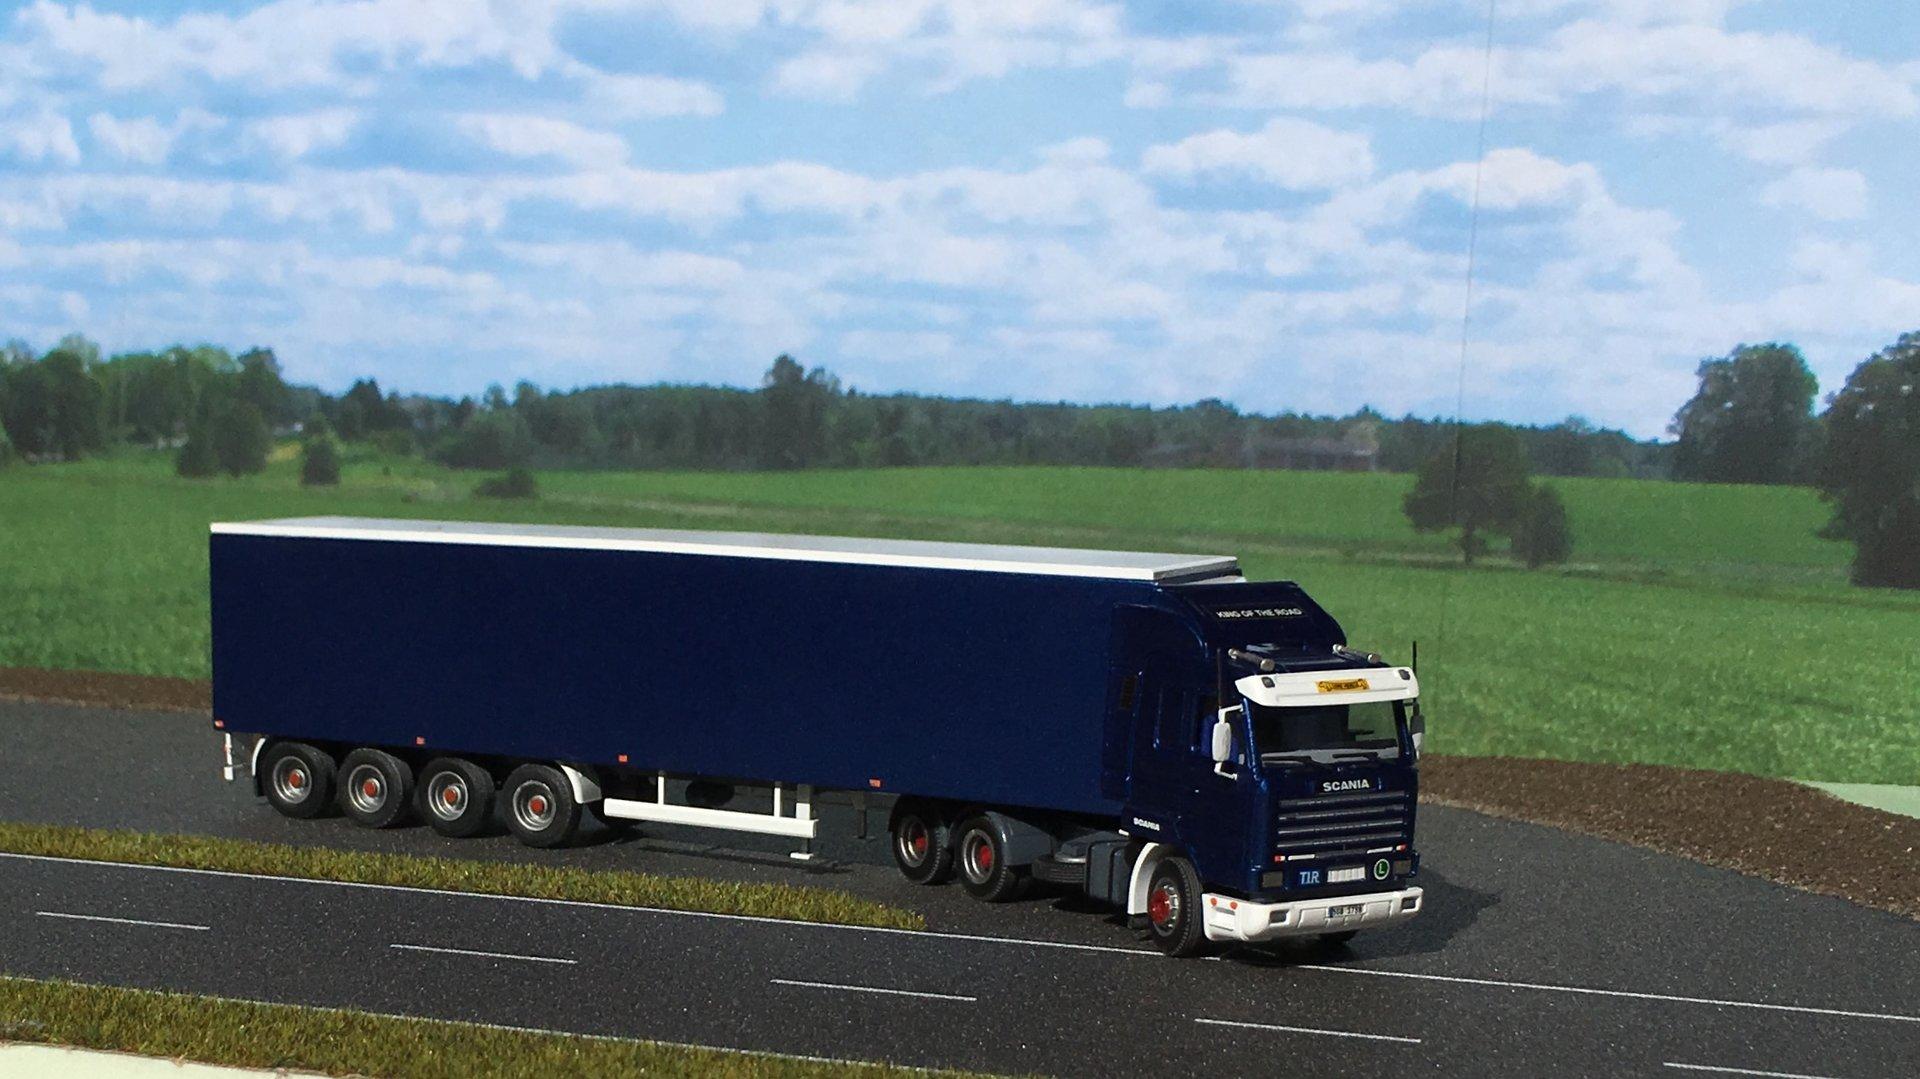 Scania AWM Naczepa 002.JPG